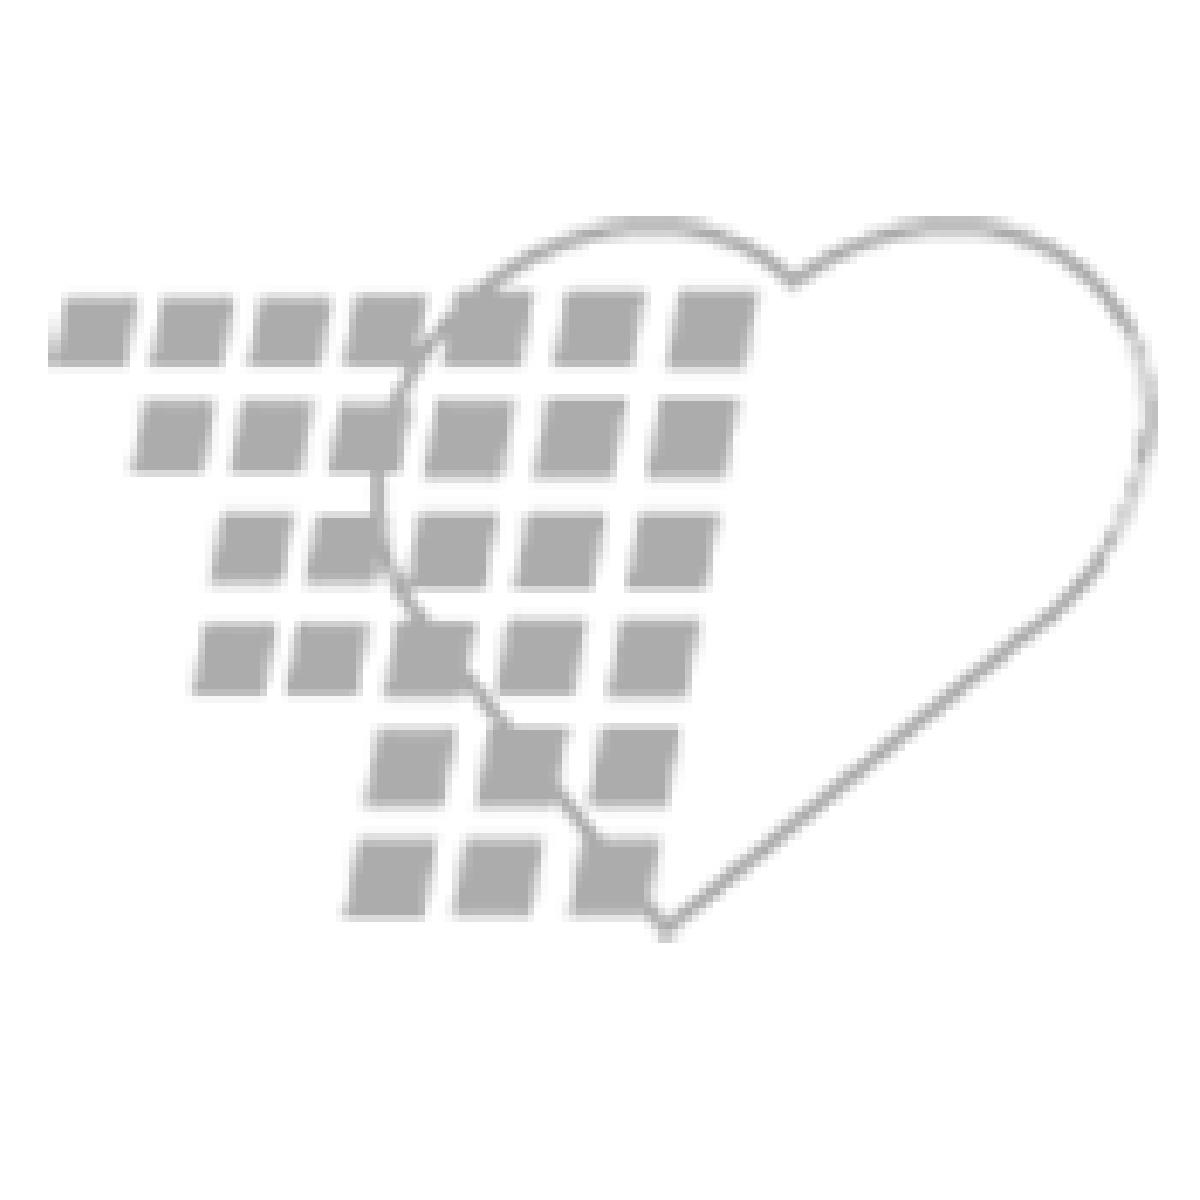 11-81-0901 Nasco Life/form® Prostate Examination Simulator